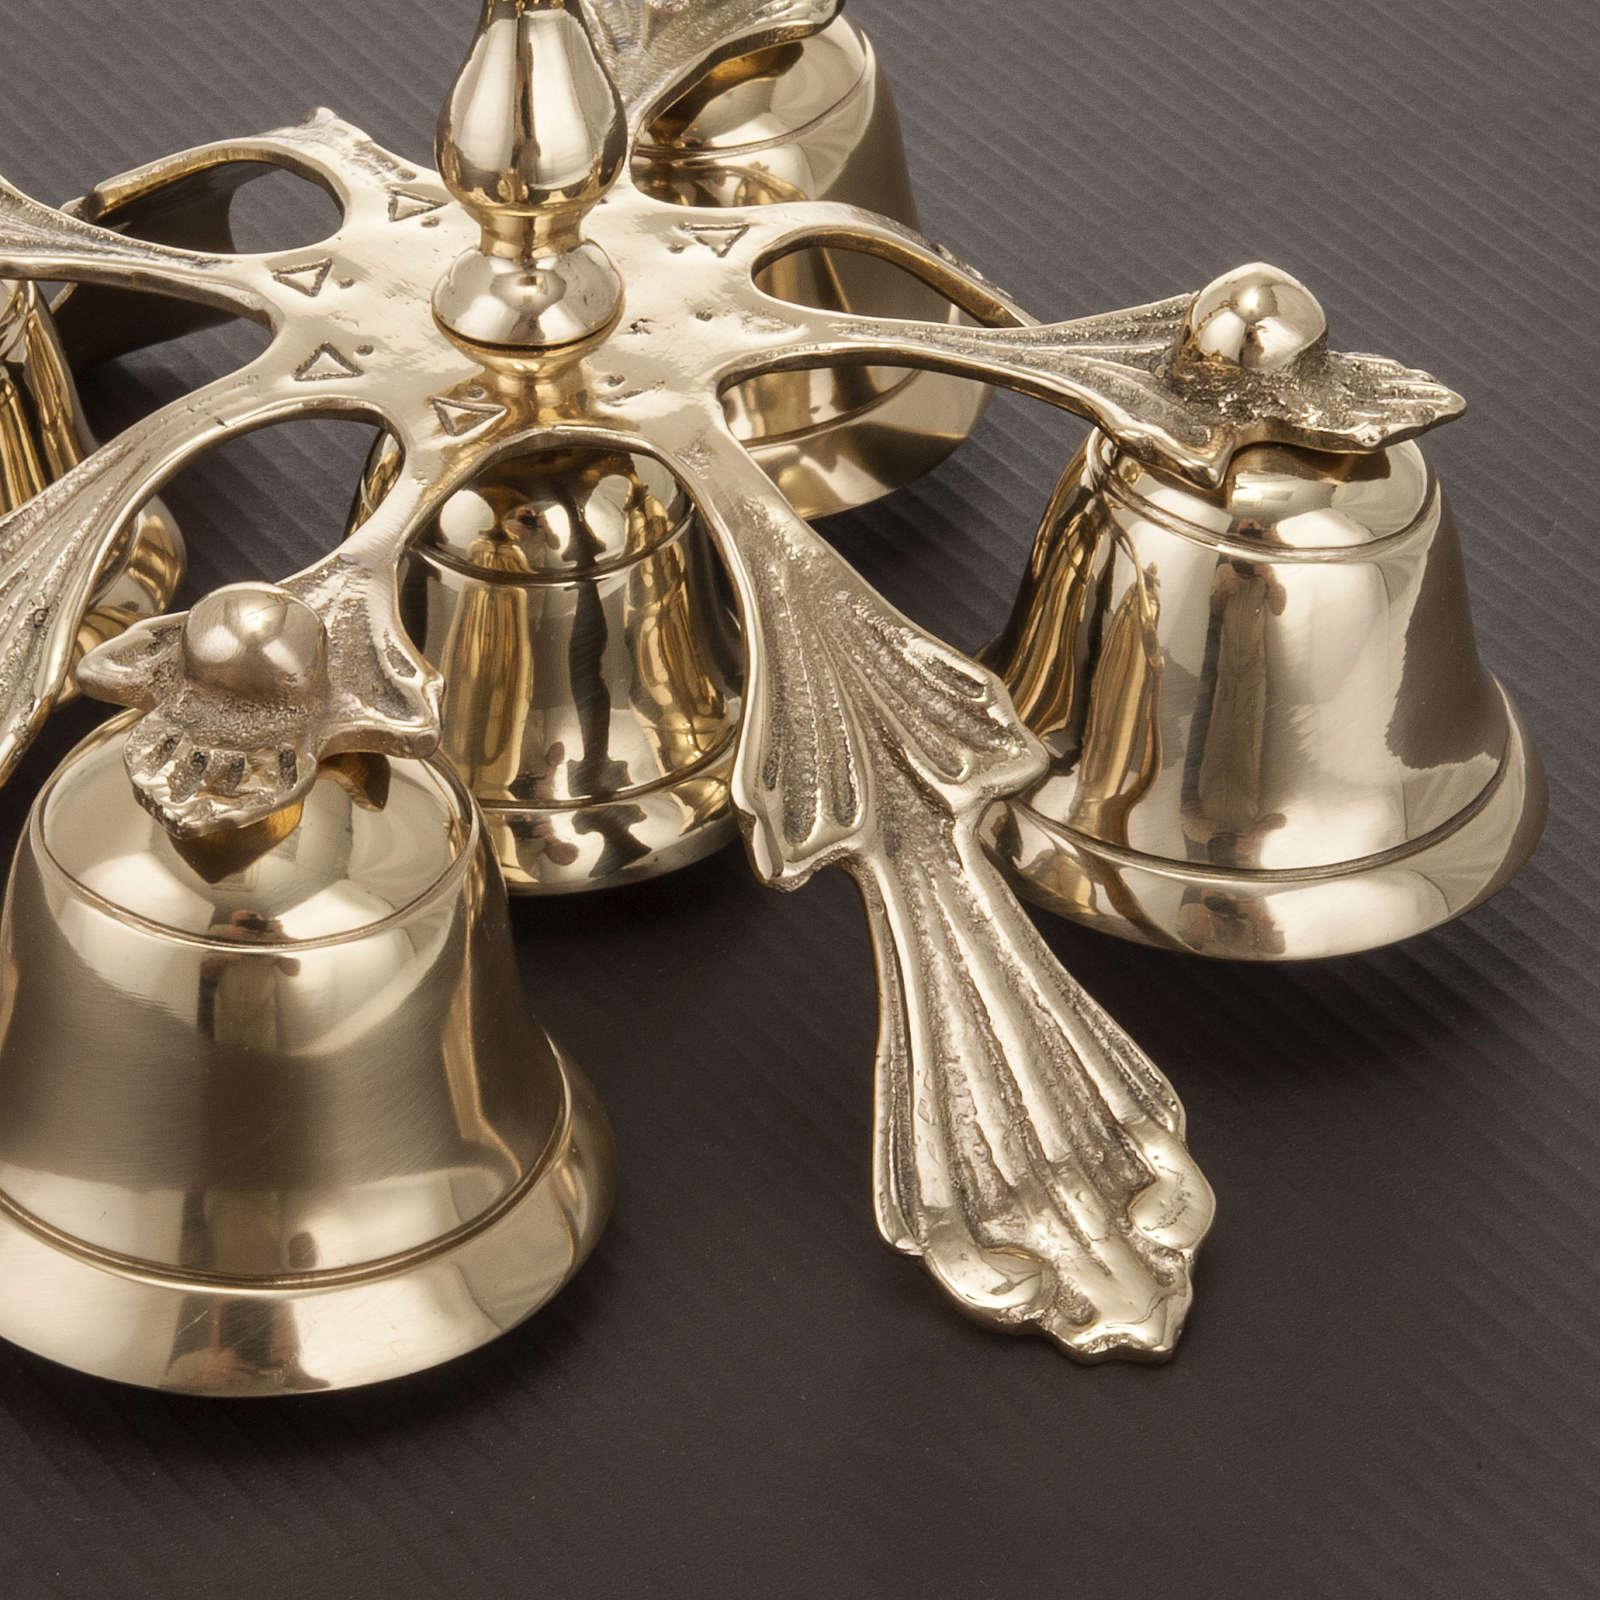 Campana litúrgica de cinco sonidos con decoración 3